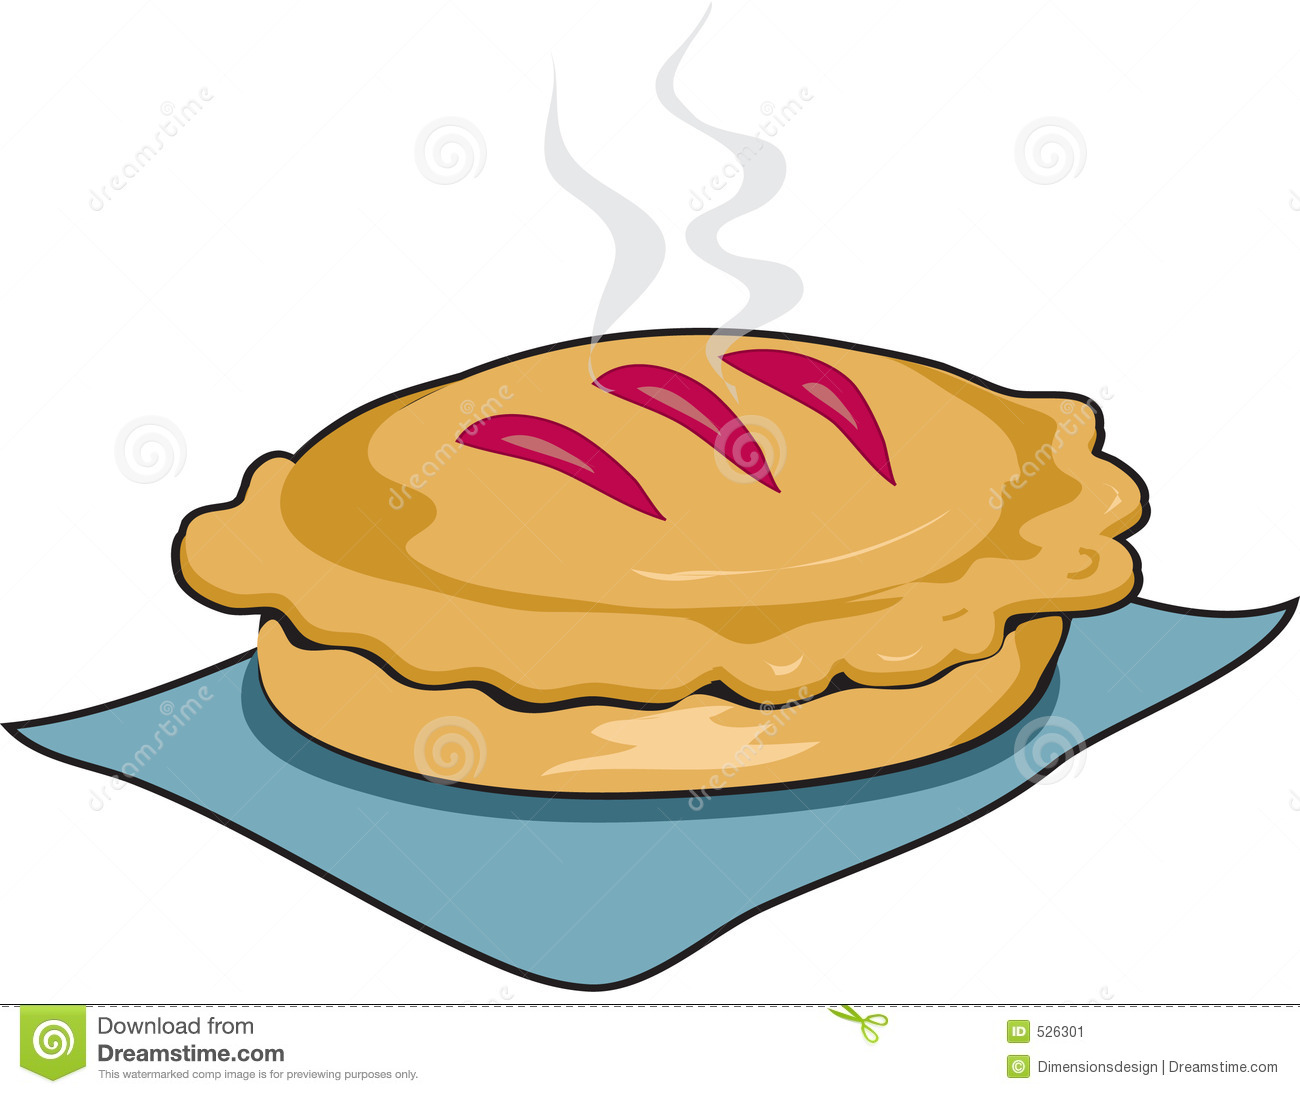 apple pie clip art free - photo #21